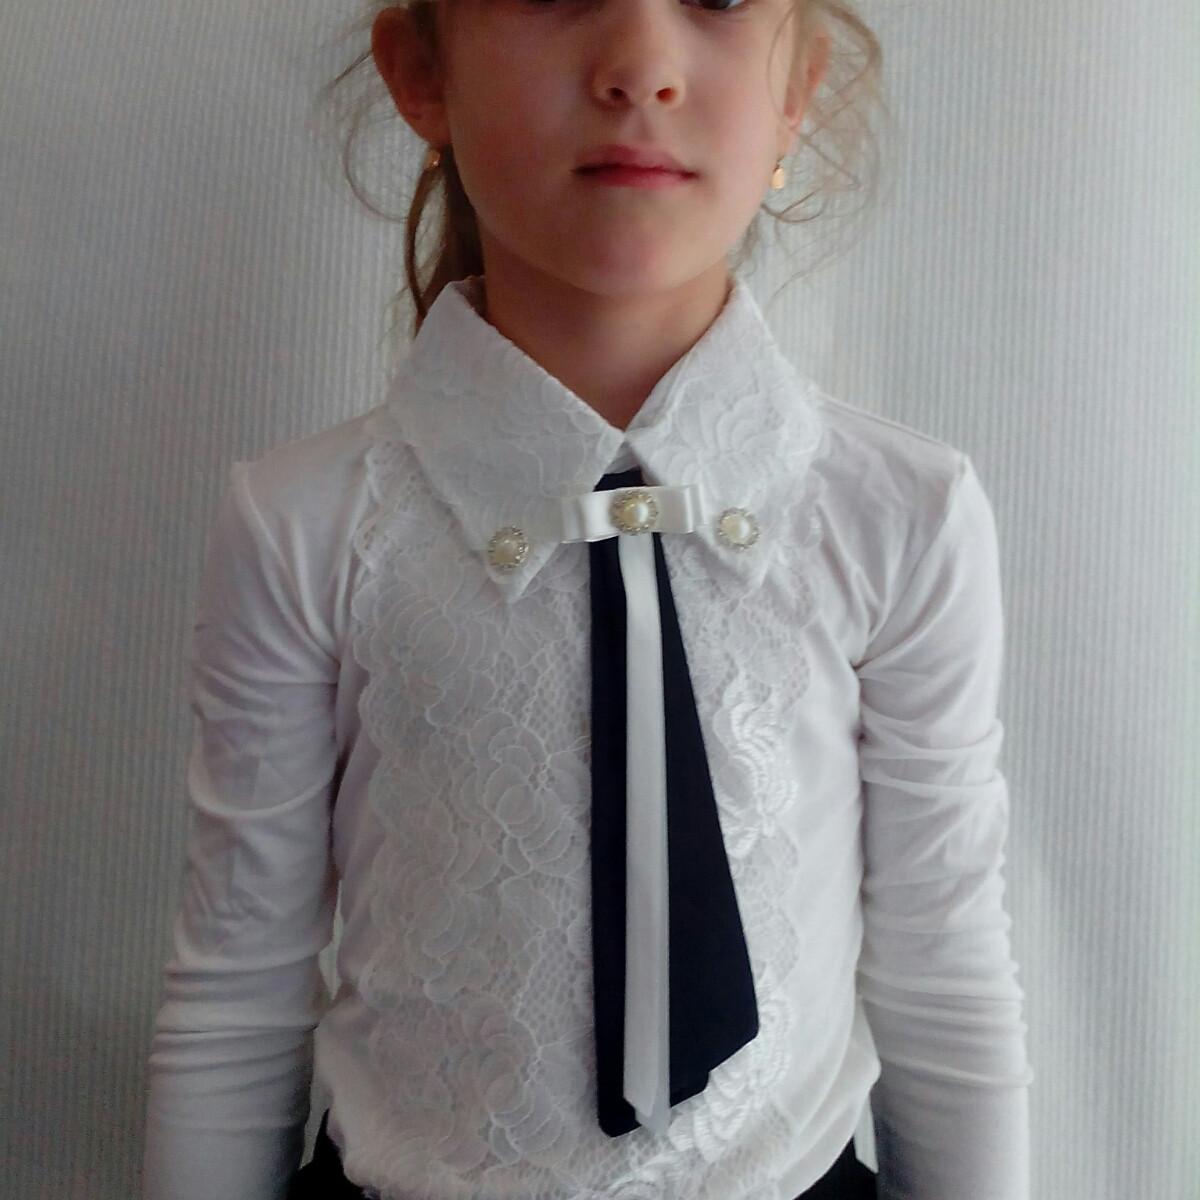 cb6354bfebd Блузка школьная для девочек   продажа